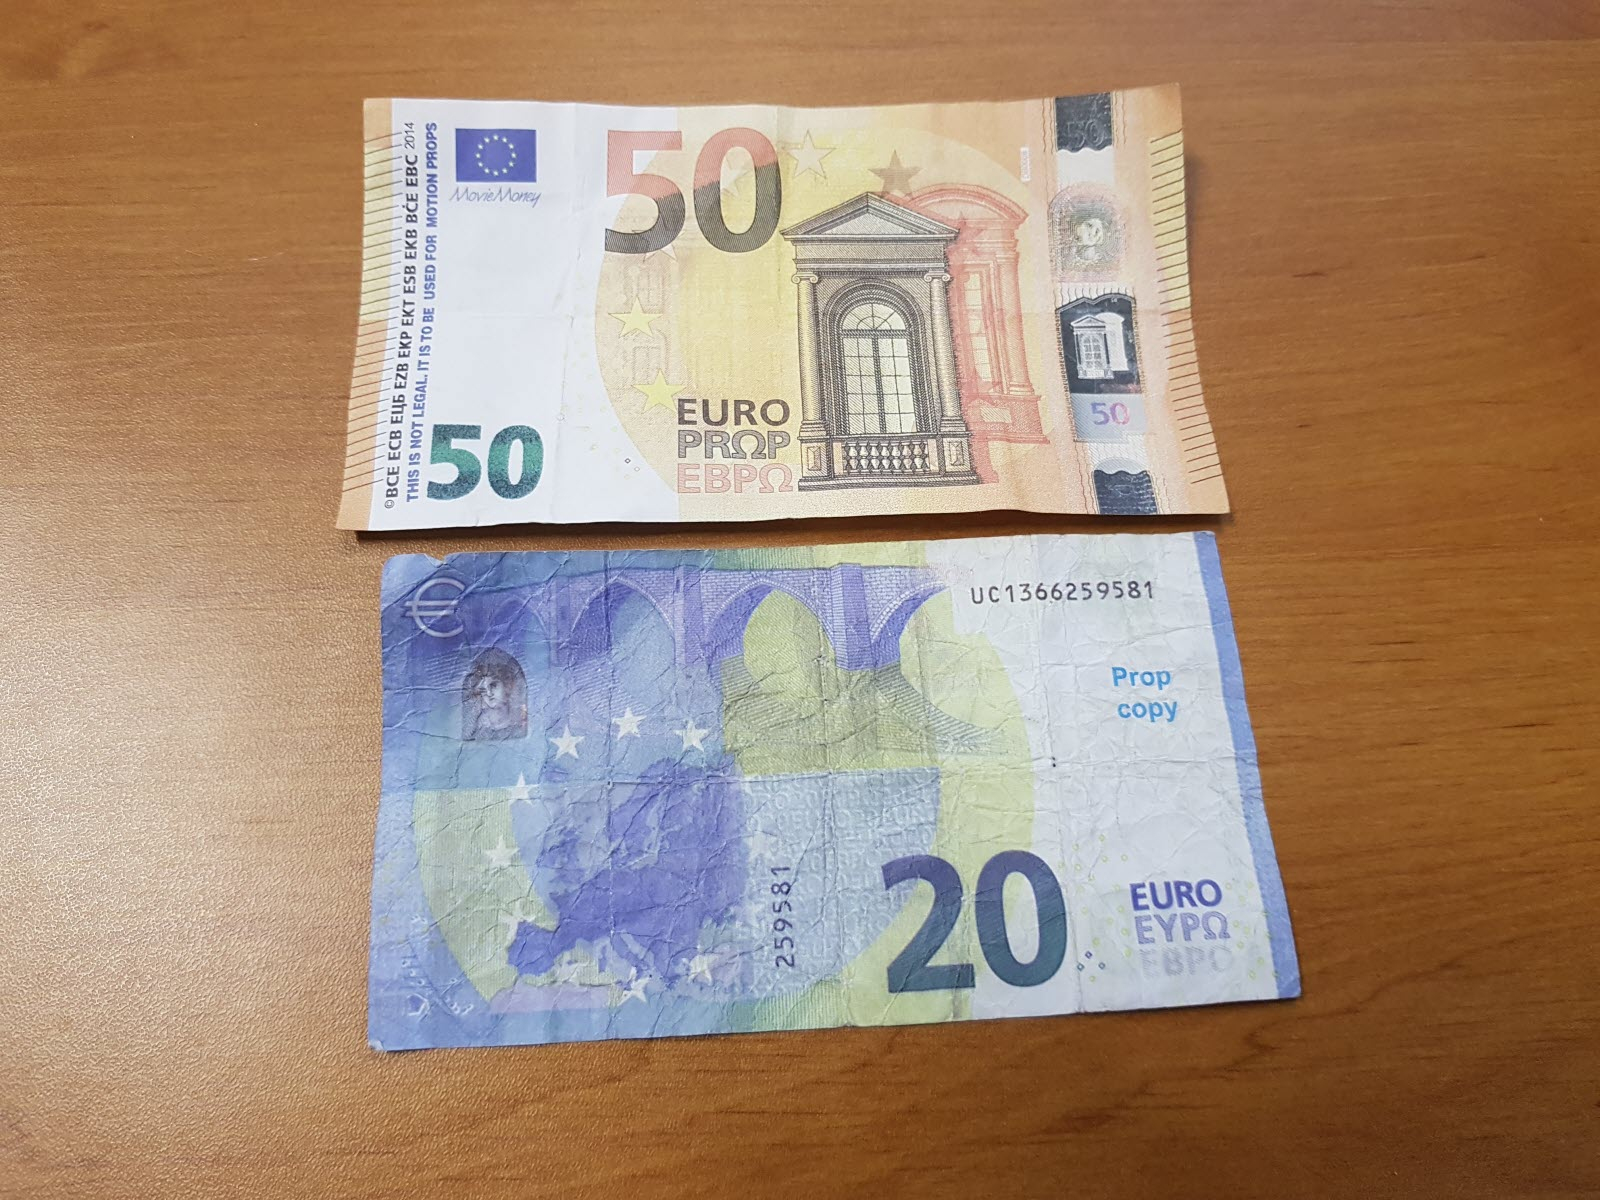 Edition Luneville | Faux Billets En Circulation : La Police concernant Imprimer Faux Billet